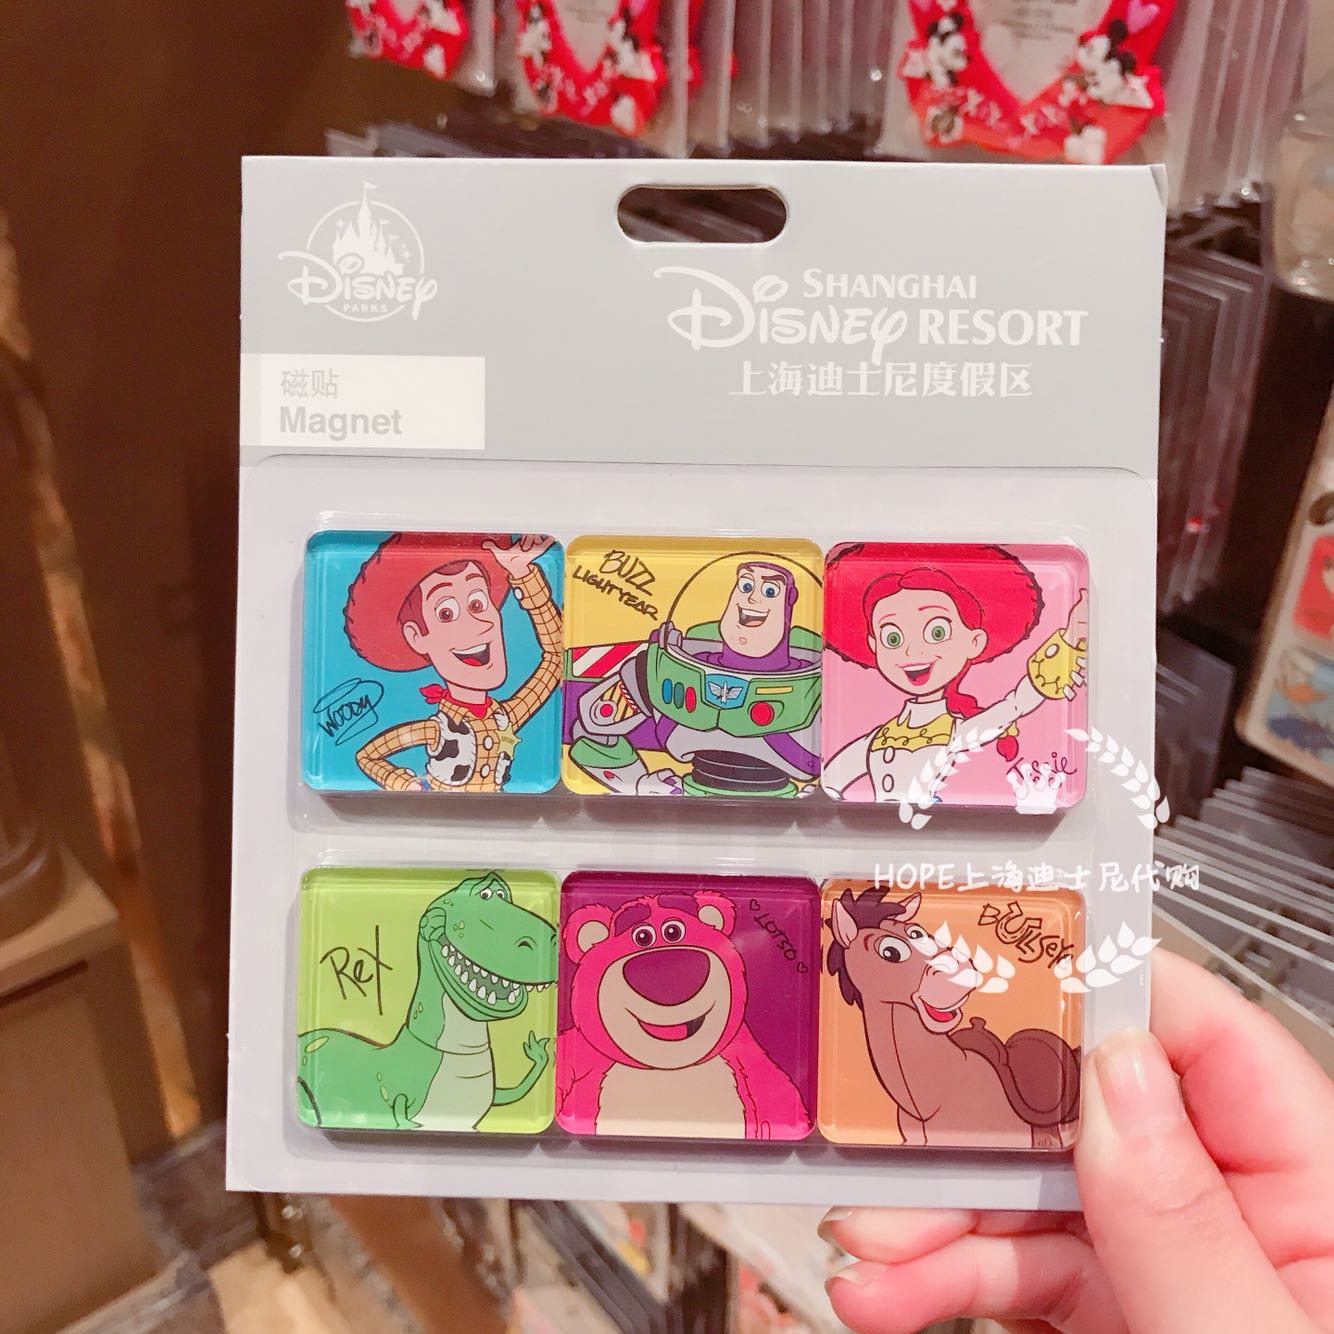 HOPE上海迪士尼代購 玩具總動員磁貼胡迪巴斯光年杰西抱抱熊